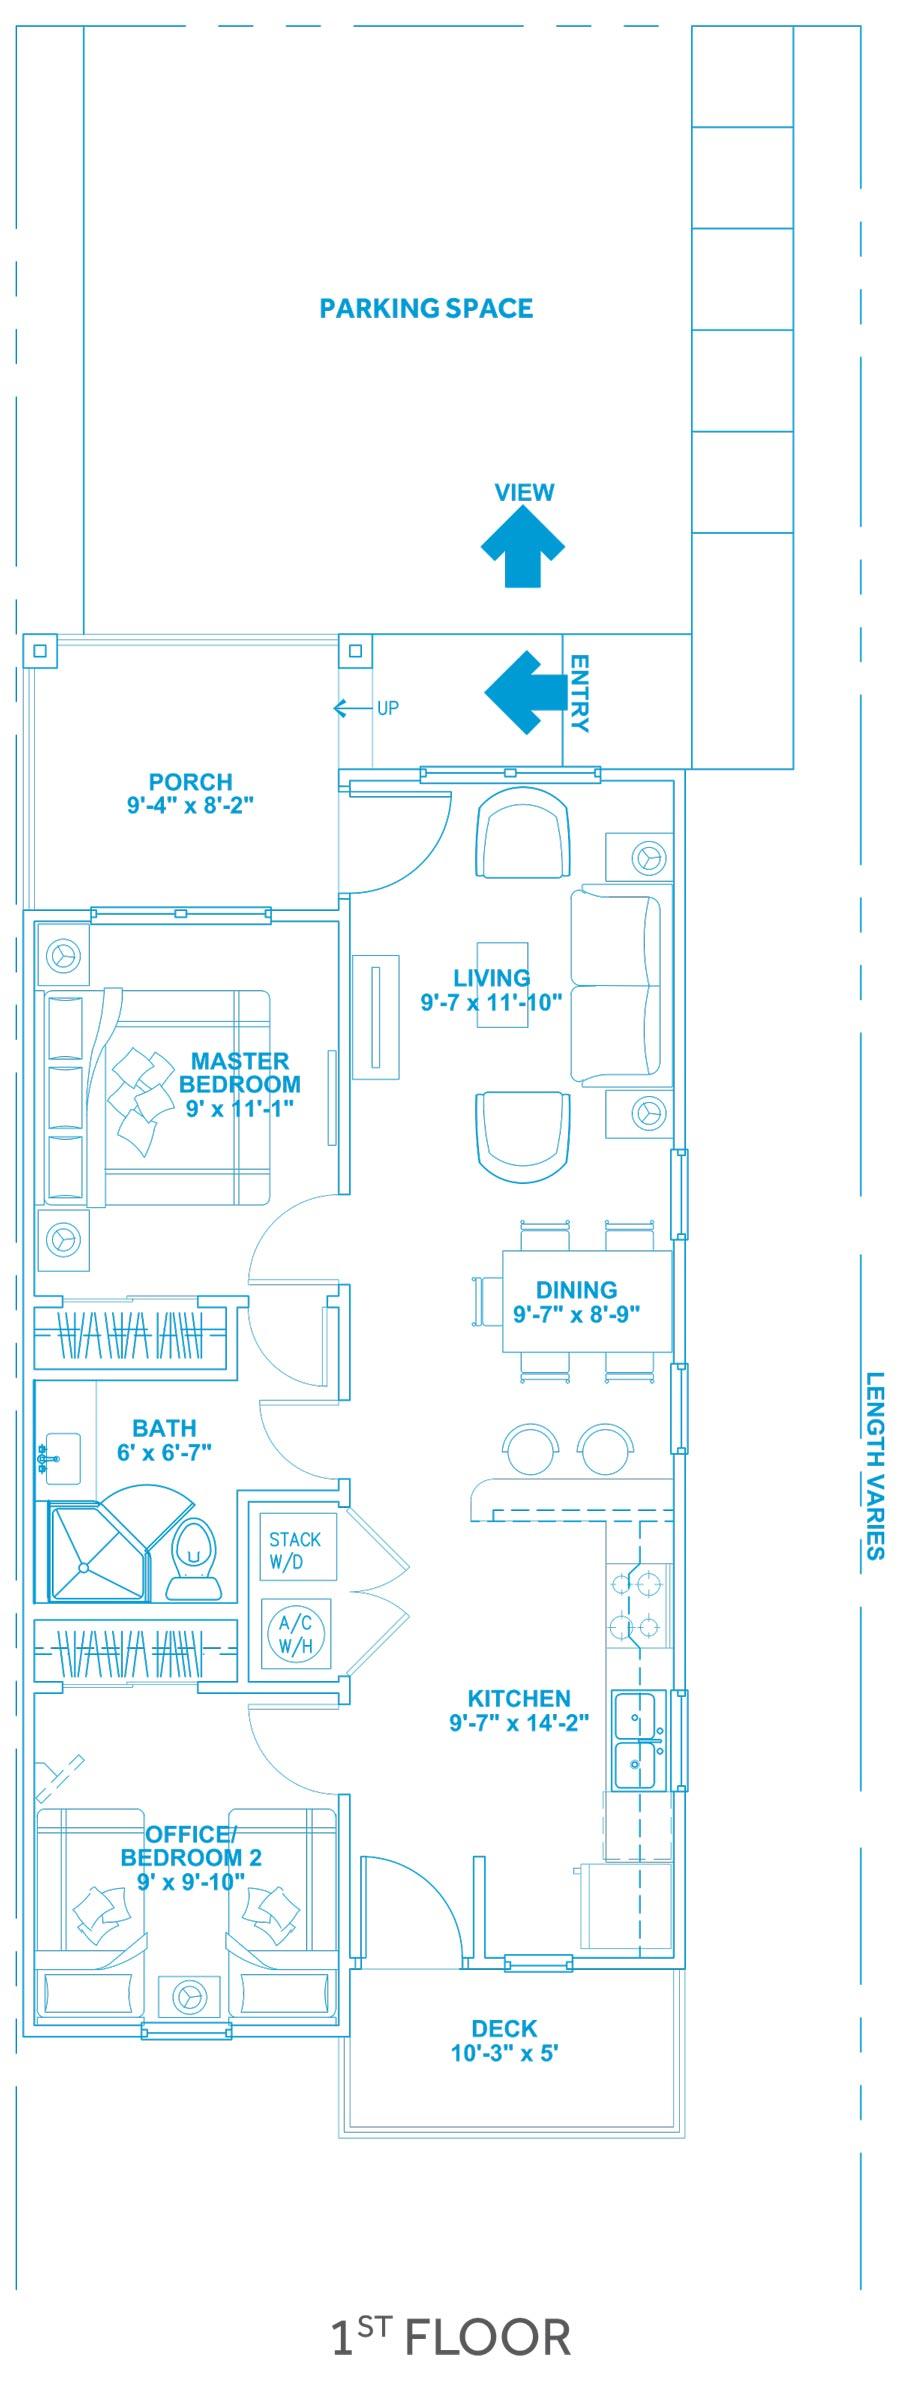 Las Joyas South Padre Beach Houses - Beach House A2 First Floor Plan